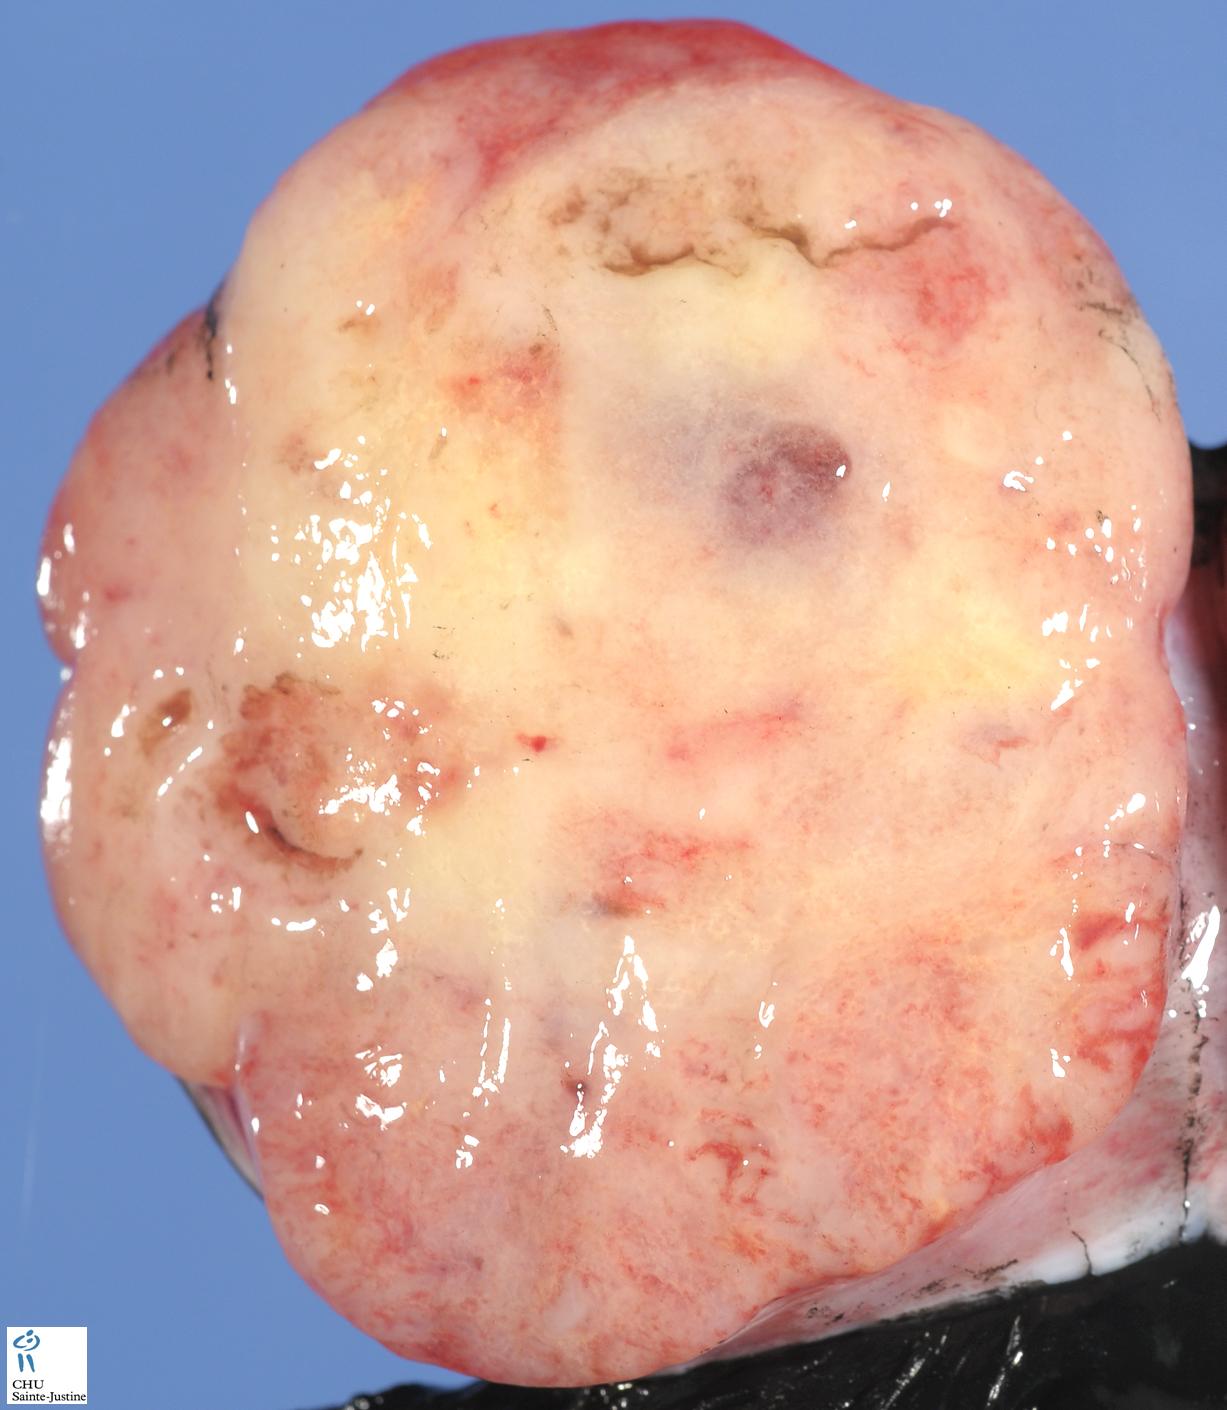 the tumors